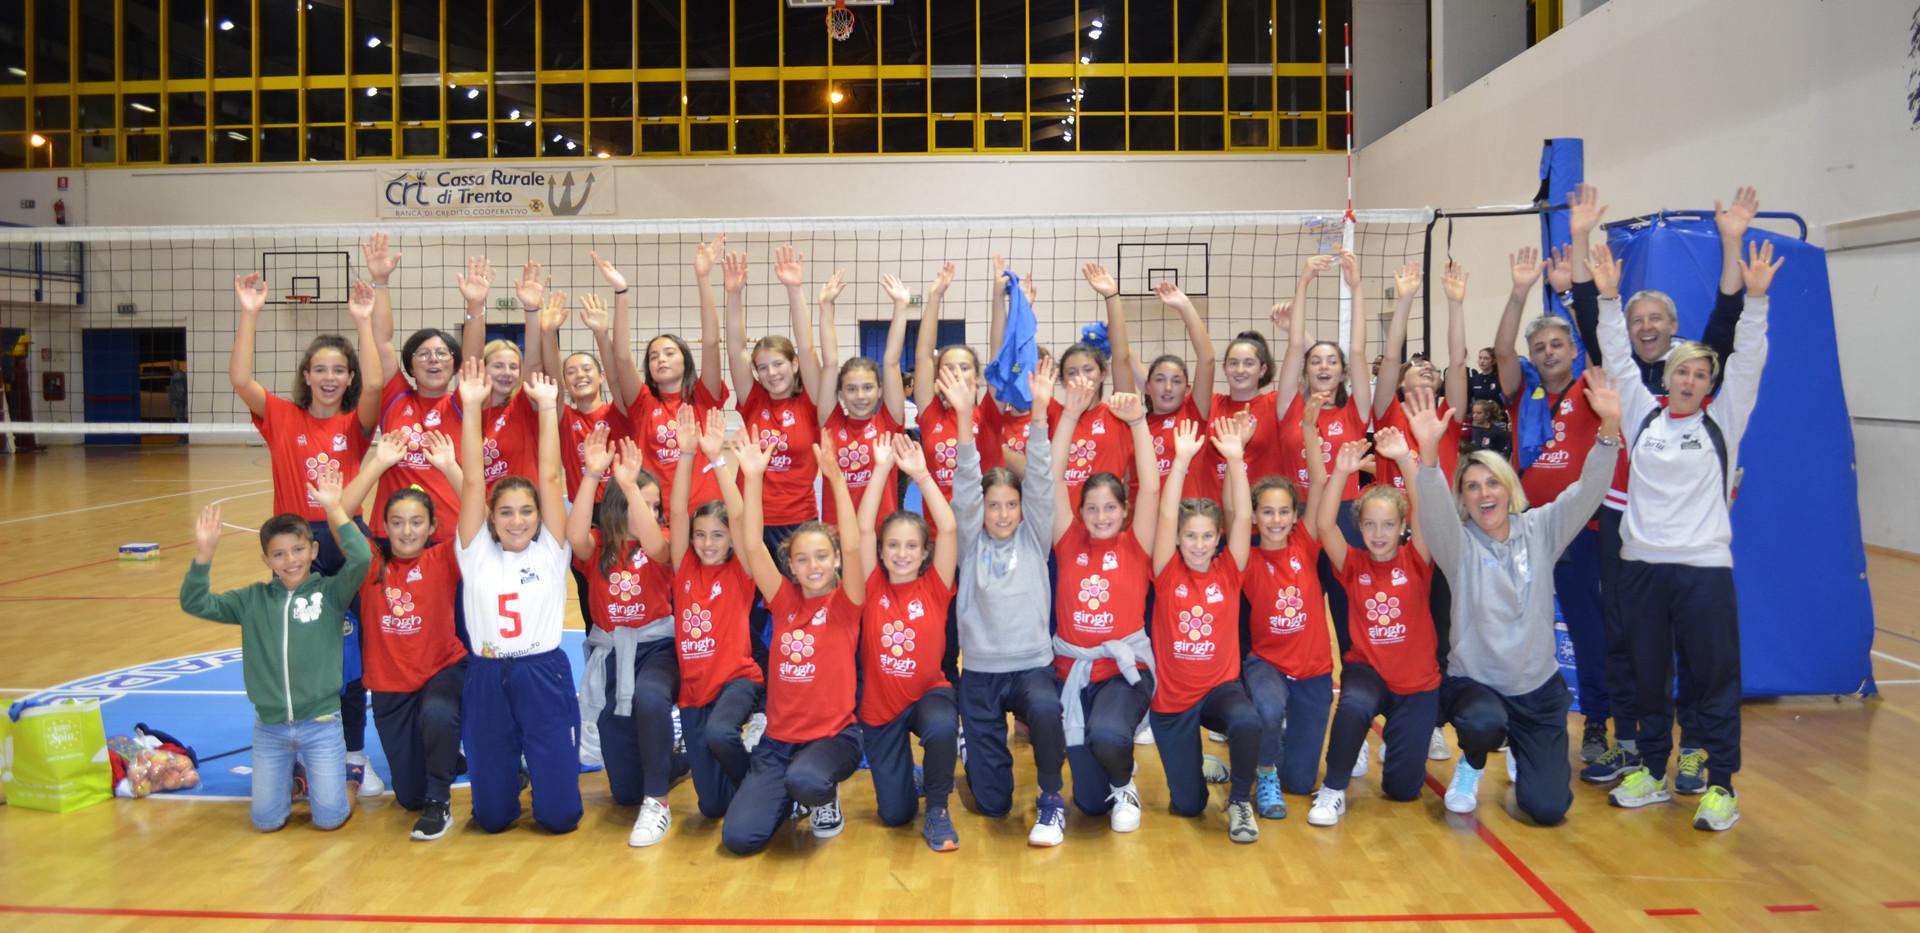 Torneo_Solteri_2019_1.JPG